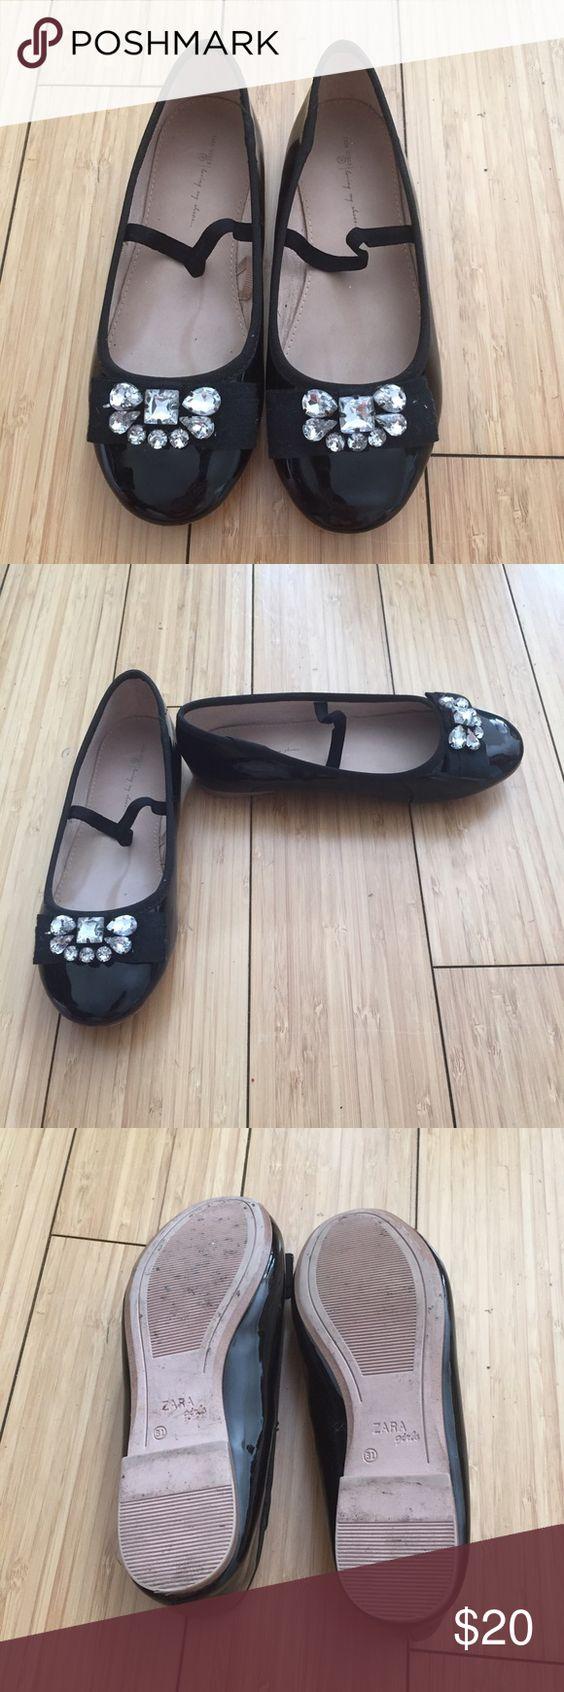 Zara girls black patent leather shoes Zara girls black patent leather shoes Zara Shoes Flats & Loafers